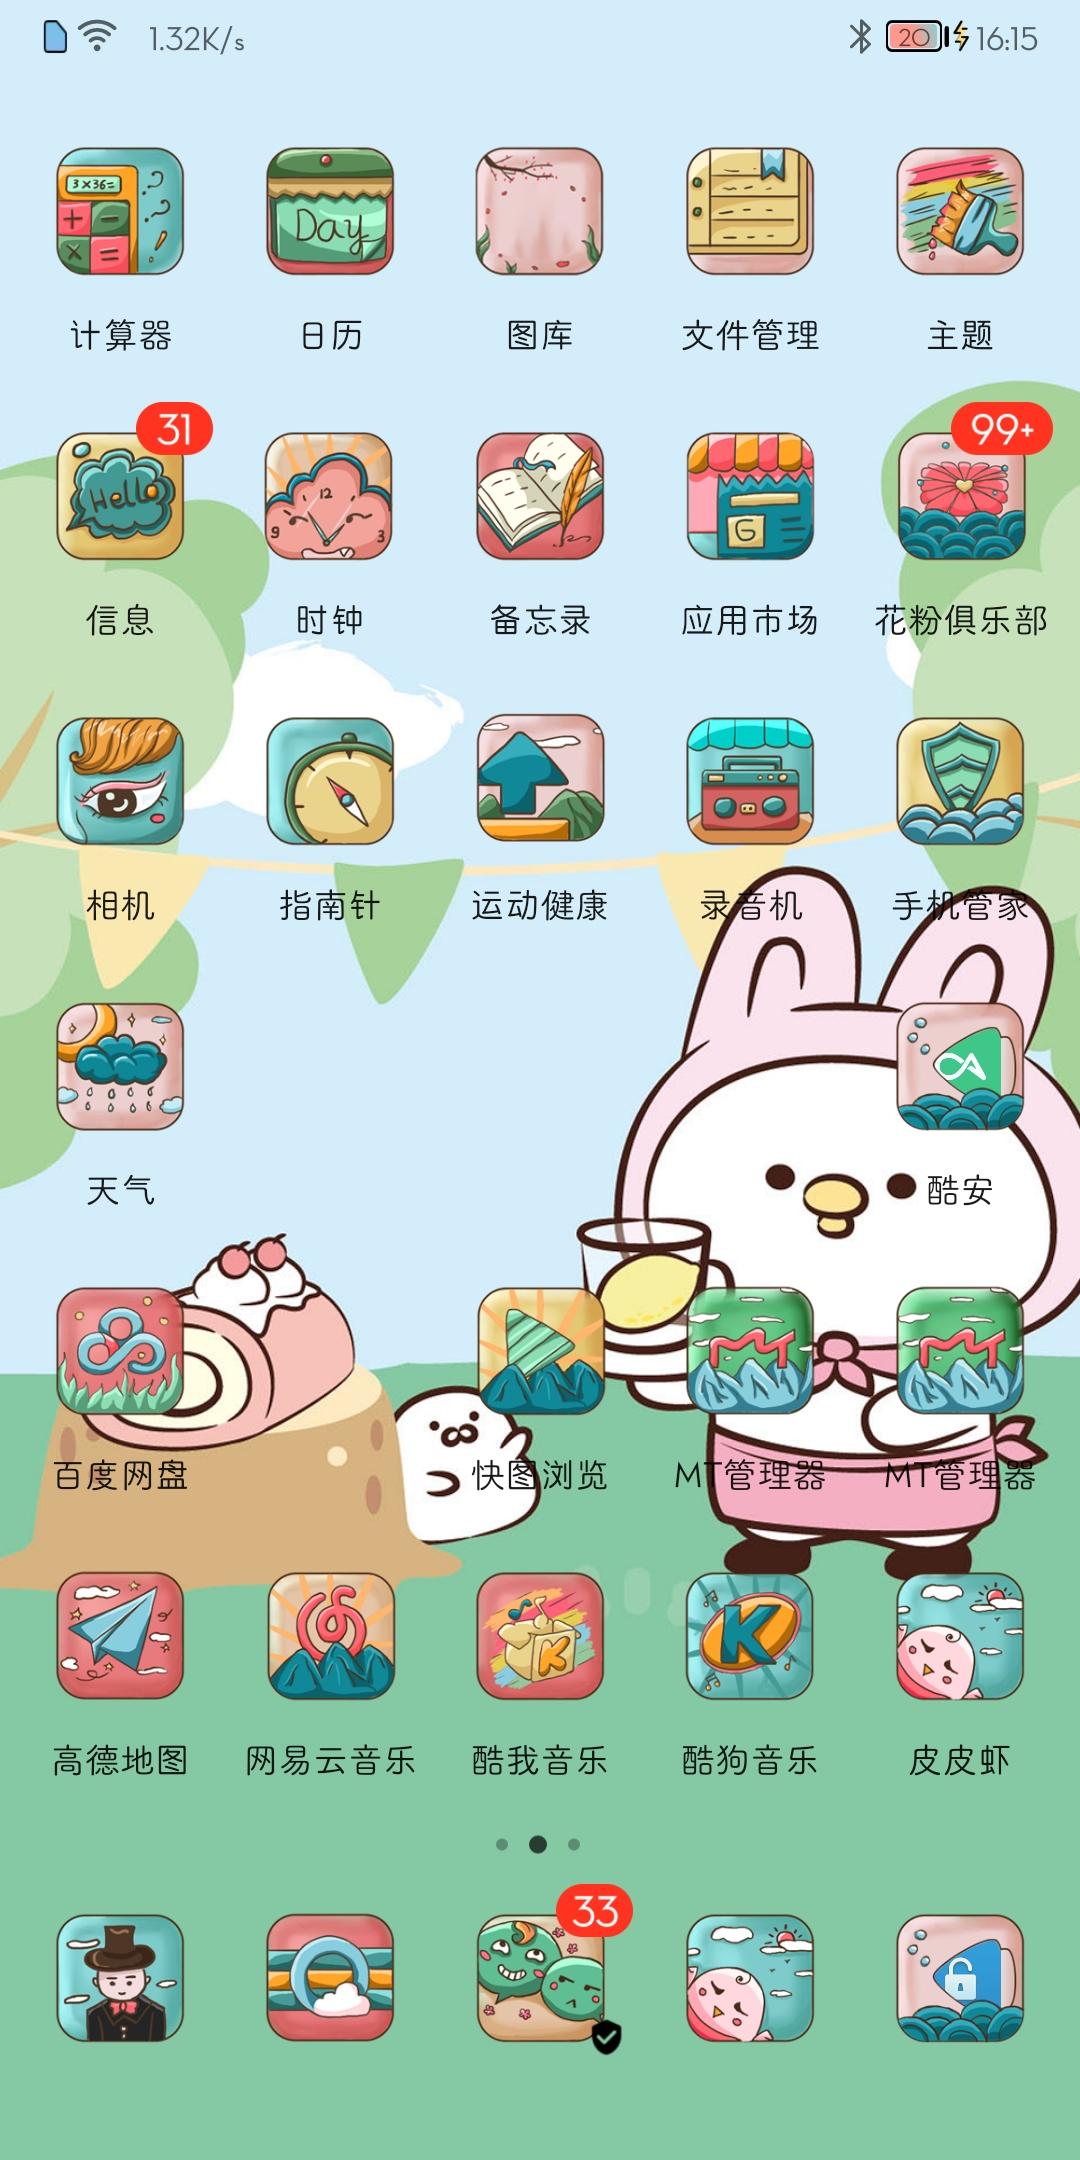 Screenshot_20201118_161510_com.huawei.android.lau.jpg